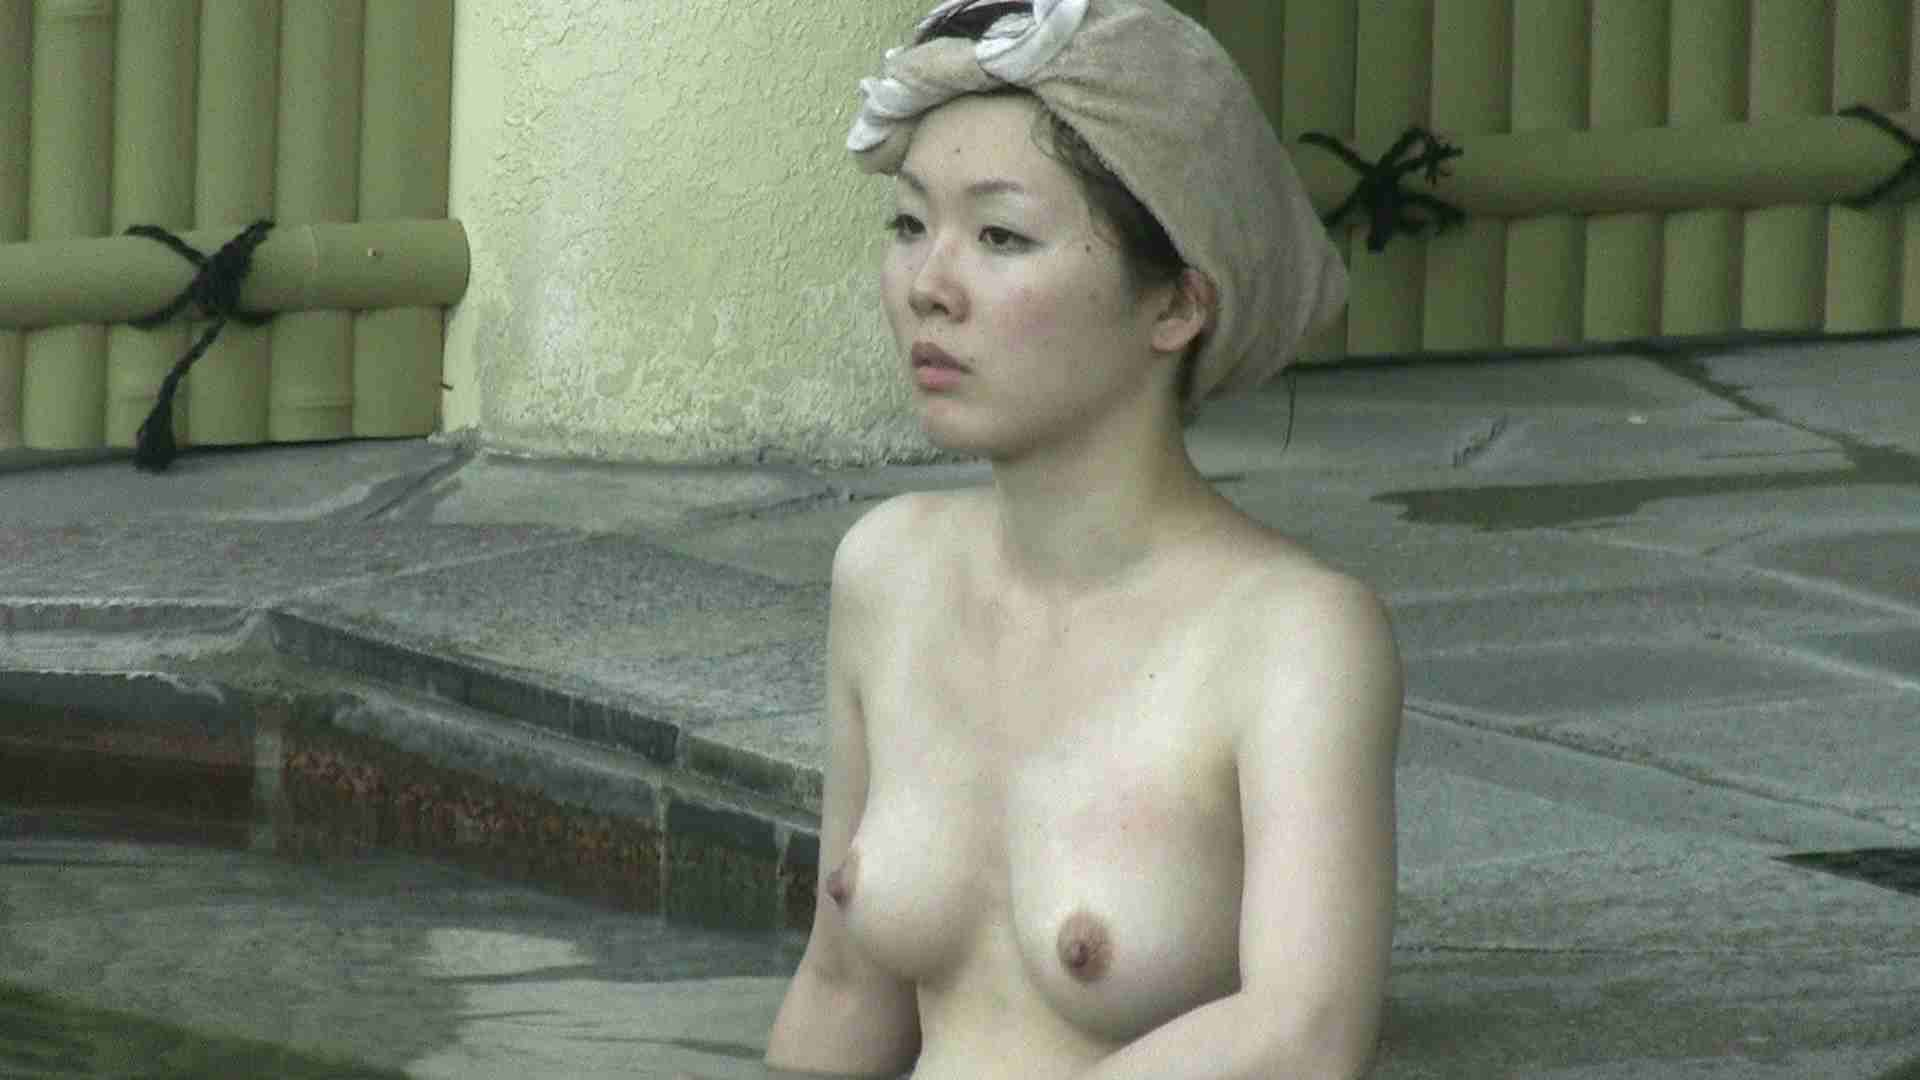 Aquaな露天風呂Vol.191 露天 | OL女体  72連発 46